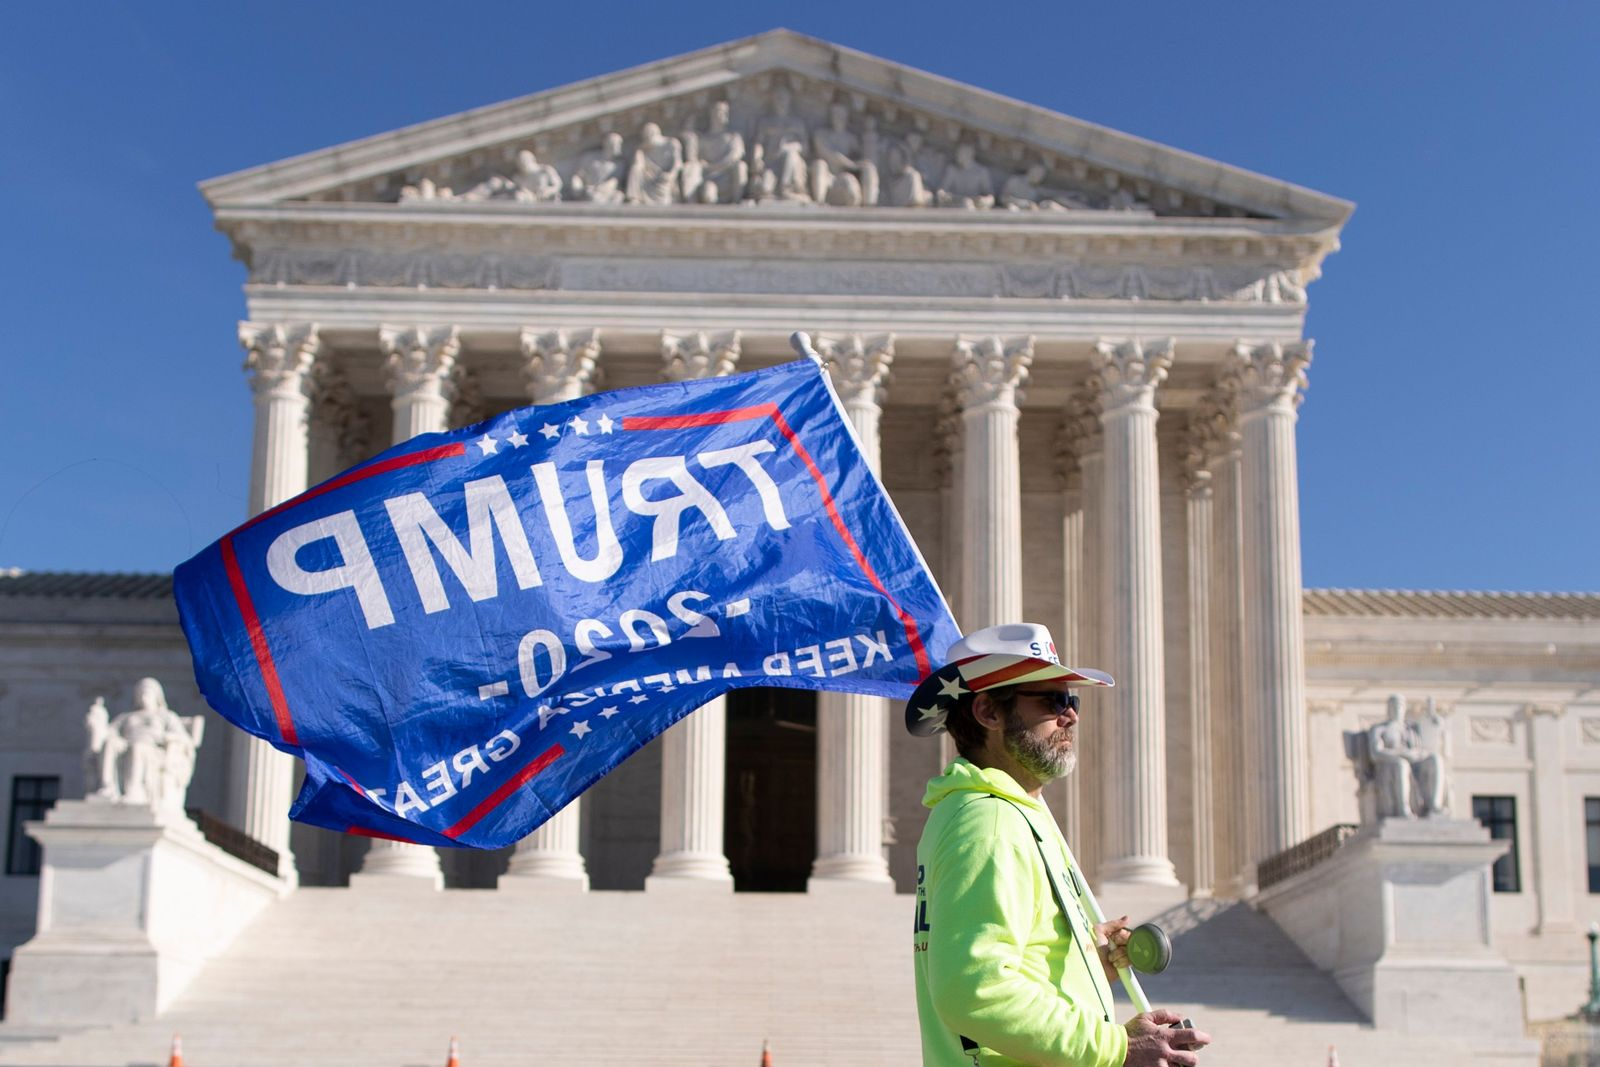 Trump supporters outside of the US Supreme Court, Washington, USA - 11 Dec 2020